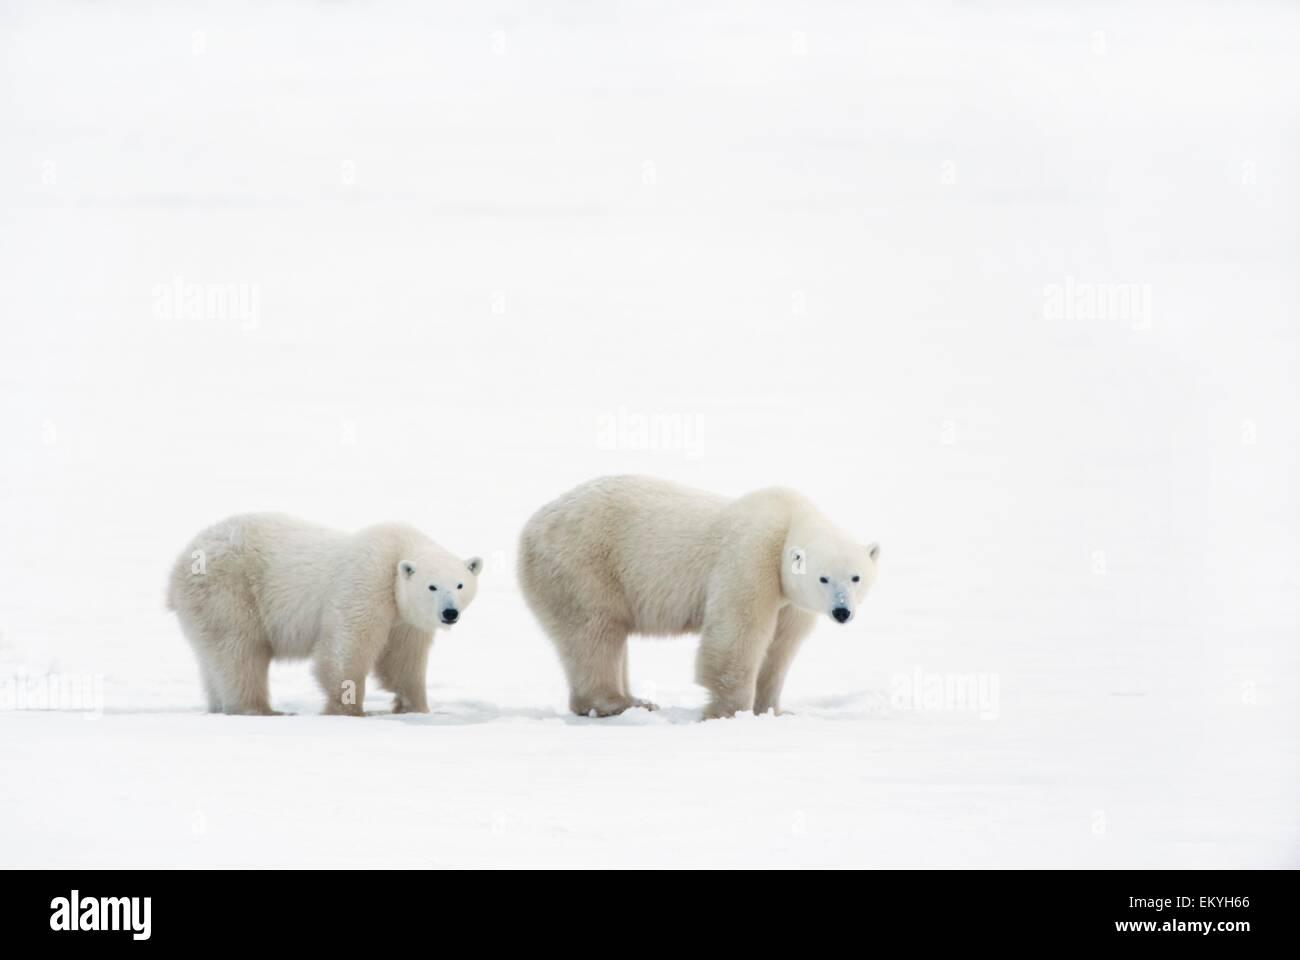 Polar Bear (Ursus Maritimus) Sow And Yearling Cub Walking Across The Frozen Tundra; Churchill, Manitoba, Canada Stock Photo